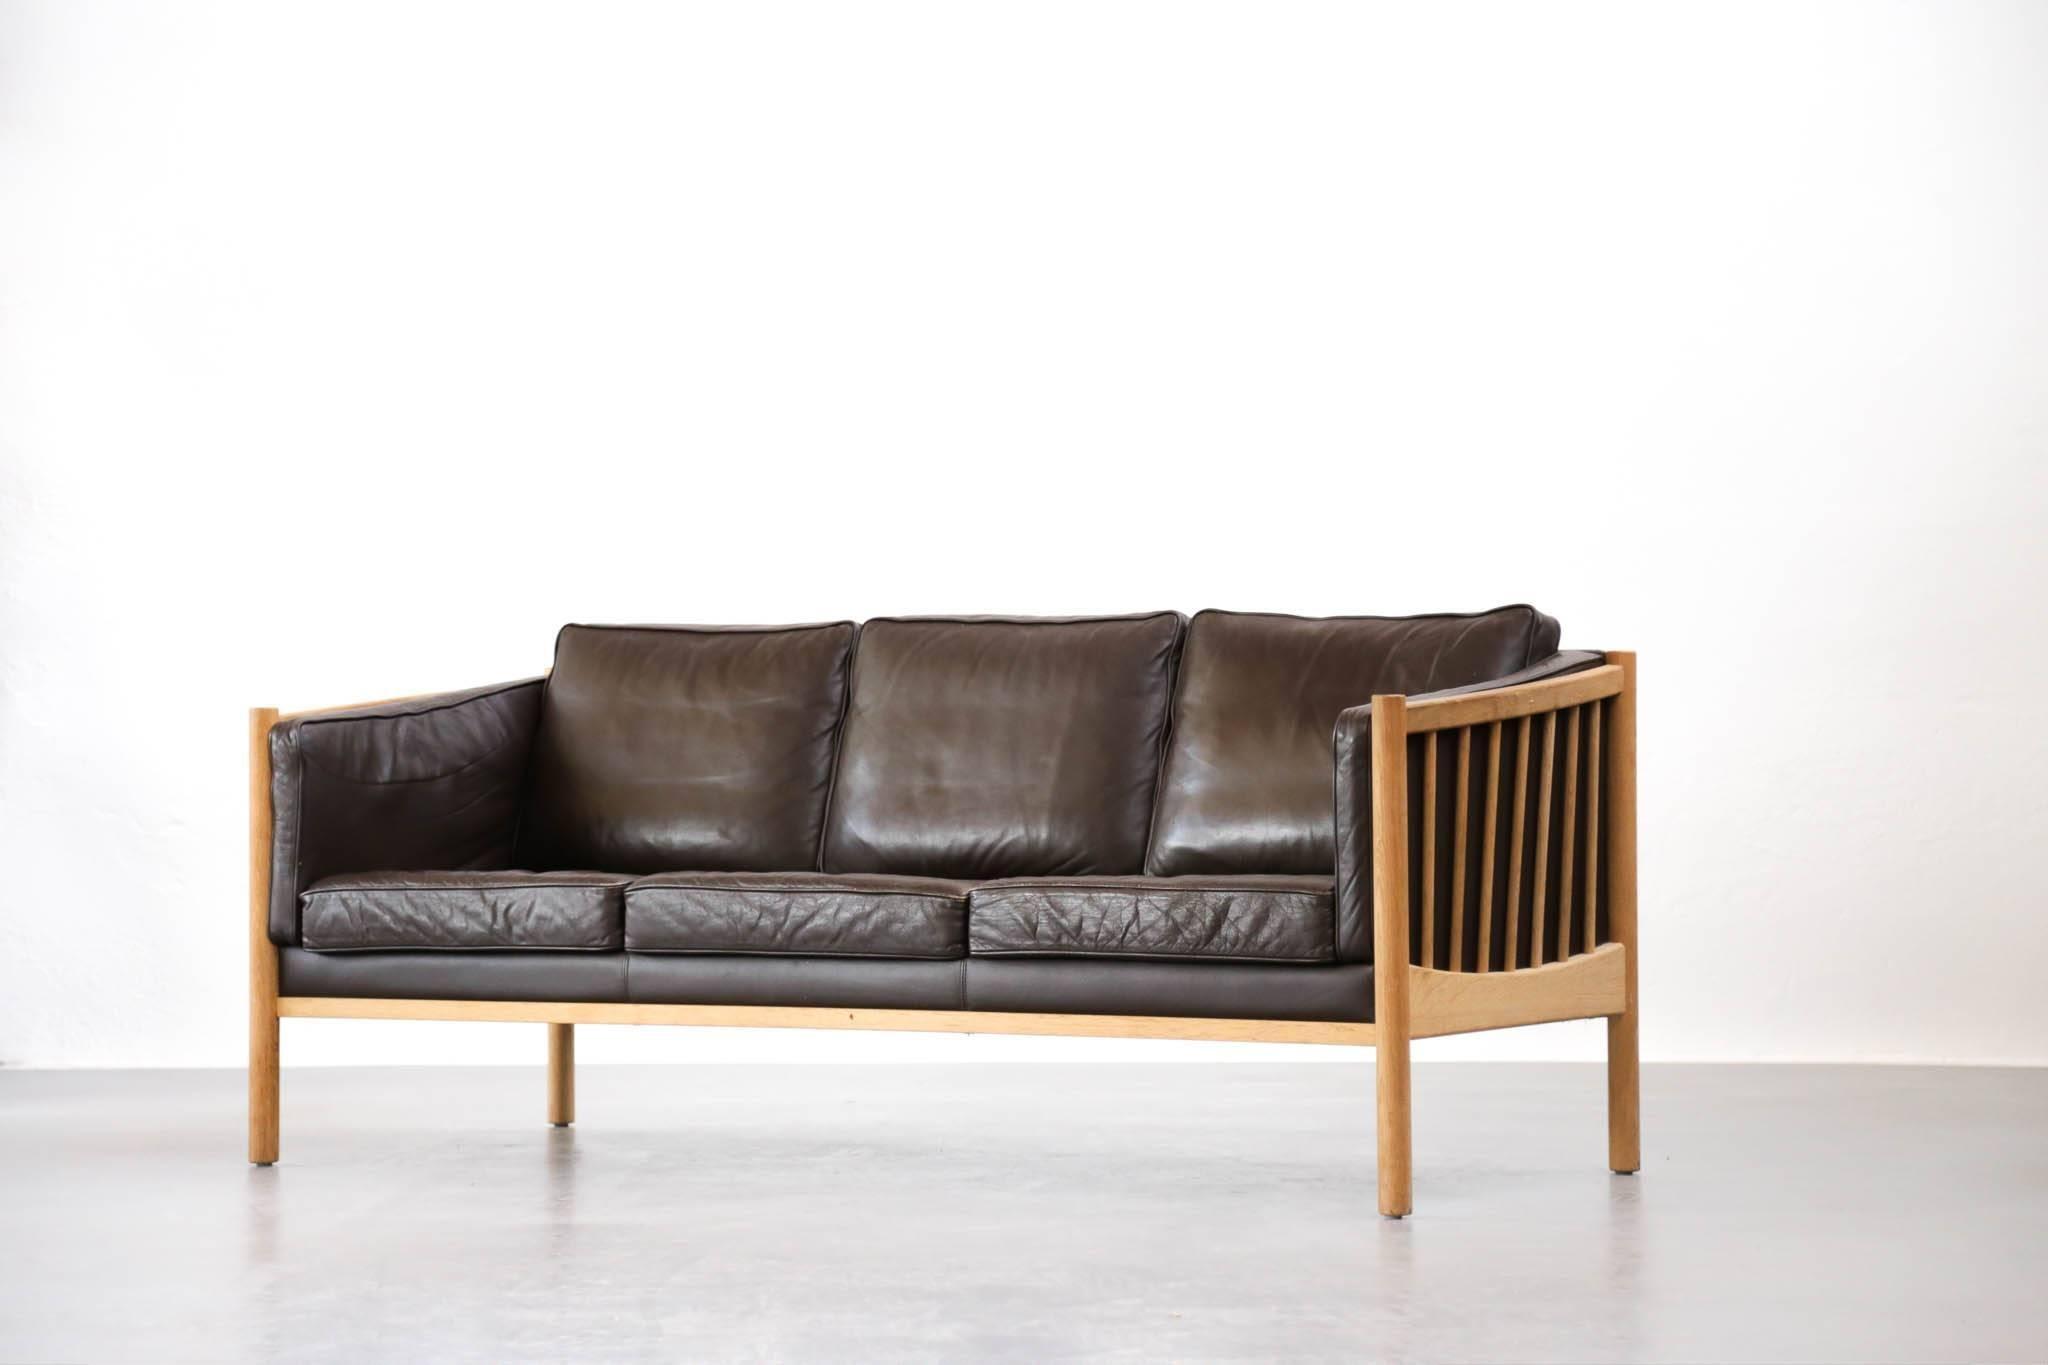 Scandinavian Modern Scandinavian Sofa Brown Leather And Oak, 1970s For Sale